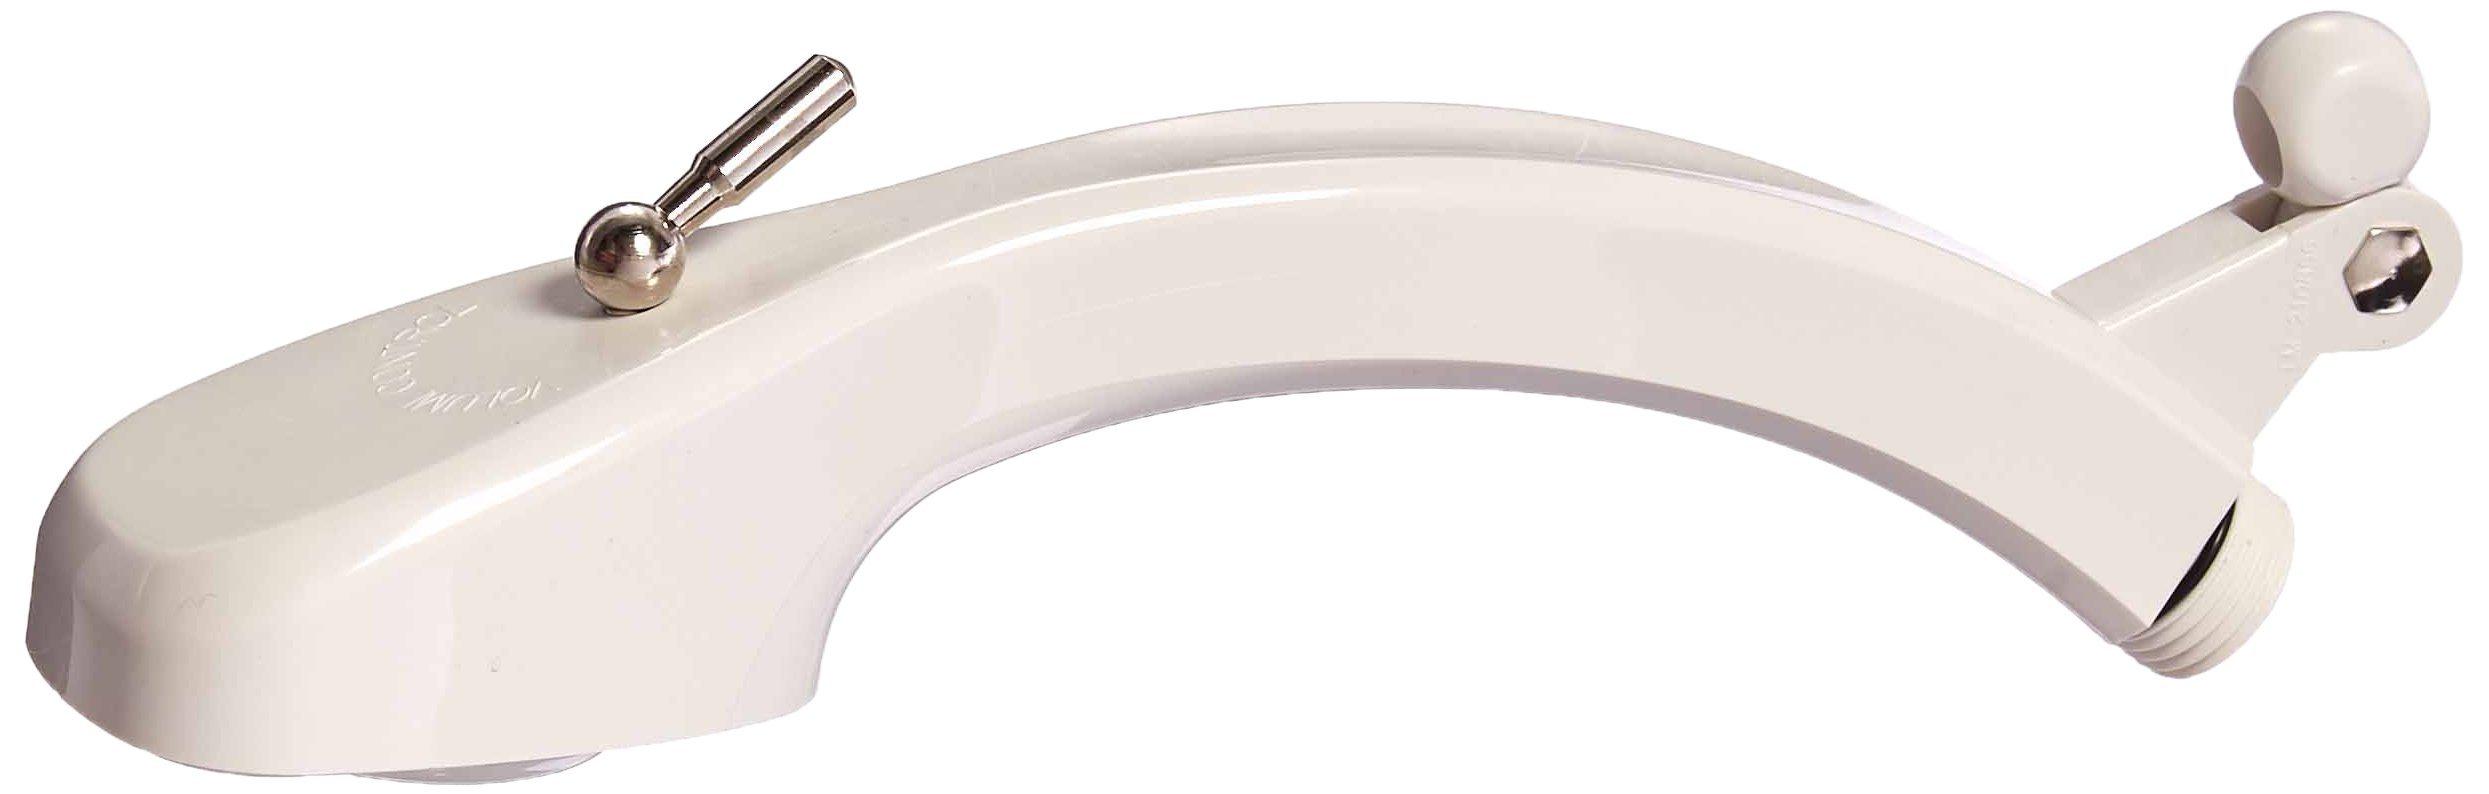 JR Products QQ-SHHE-A Shower Head